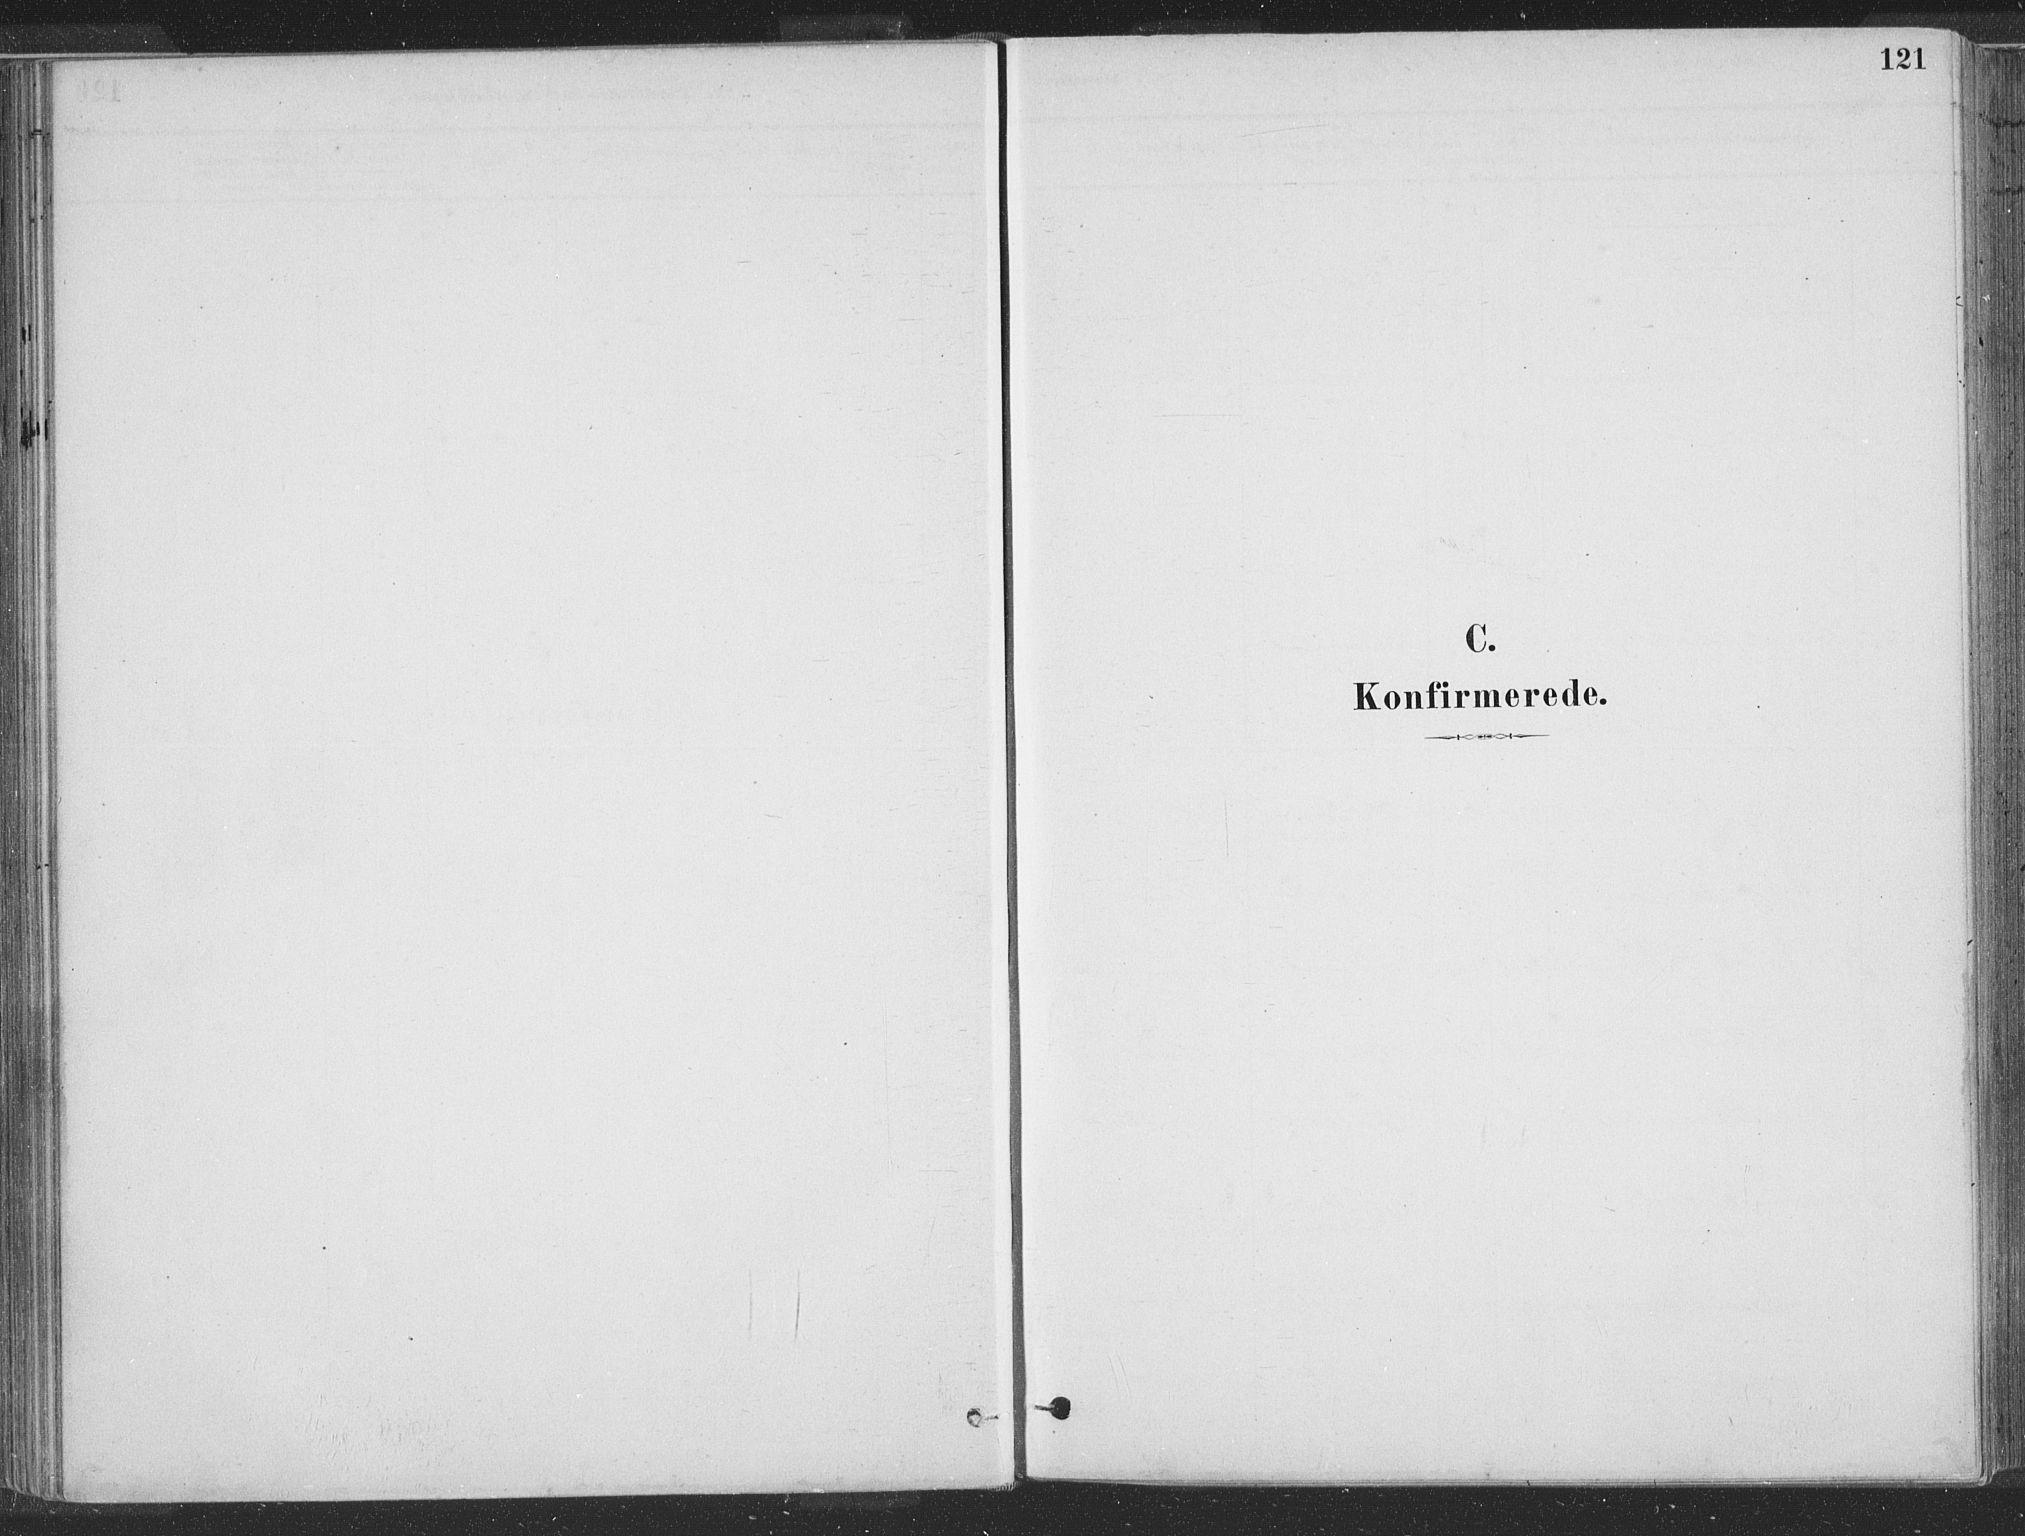 SAST, Hå sokneprestkontor, 30BA/L0010: Ministerialbok nr. A 9, 1879-1896, s. 121